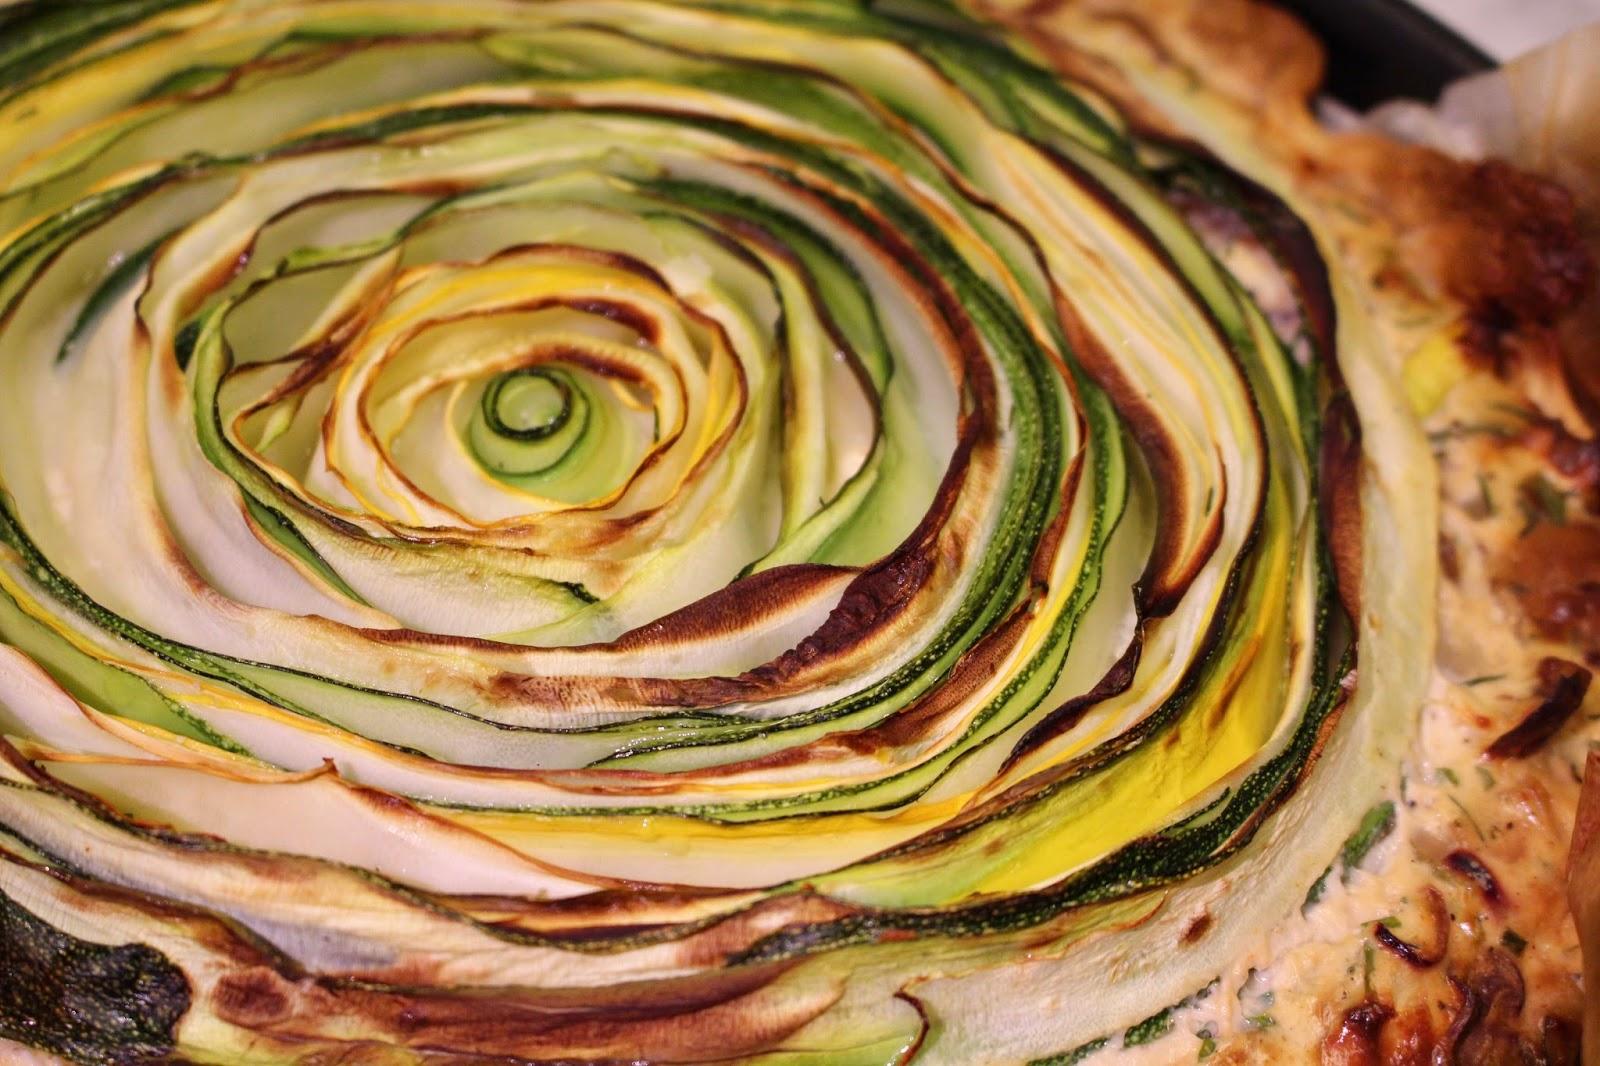 Zucchini ricotta quiche